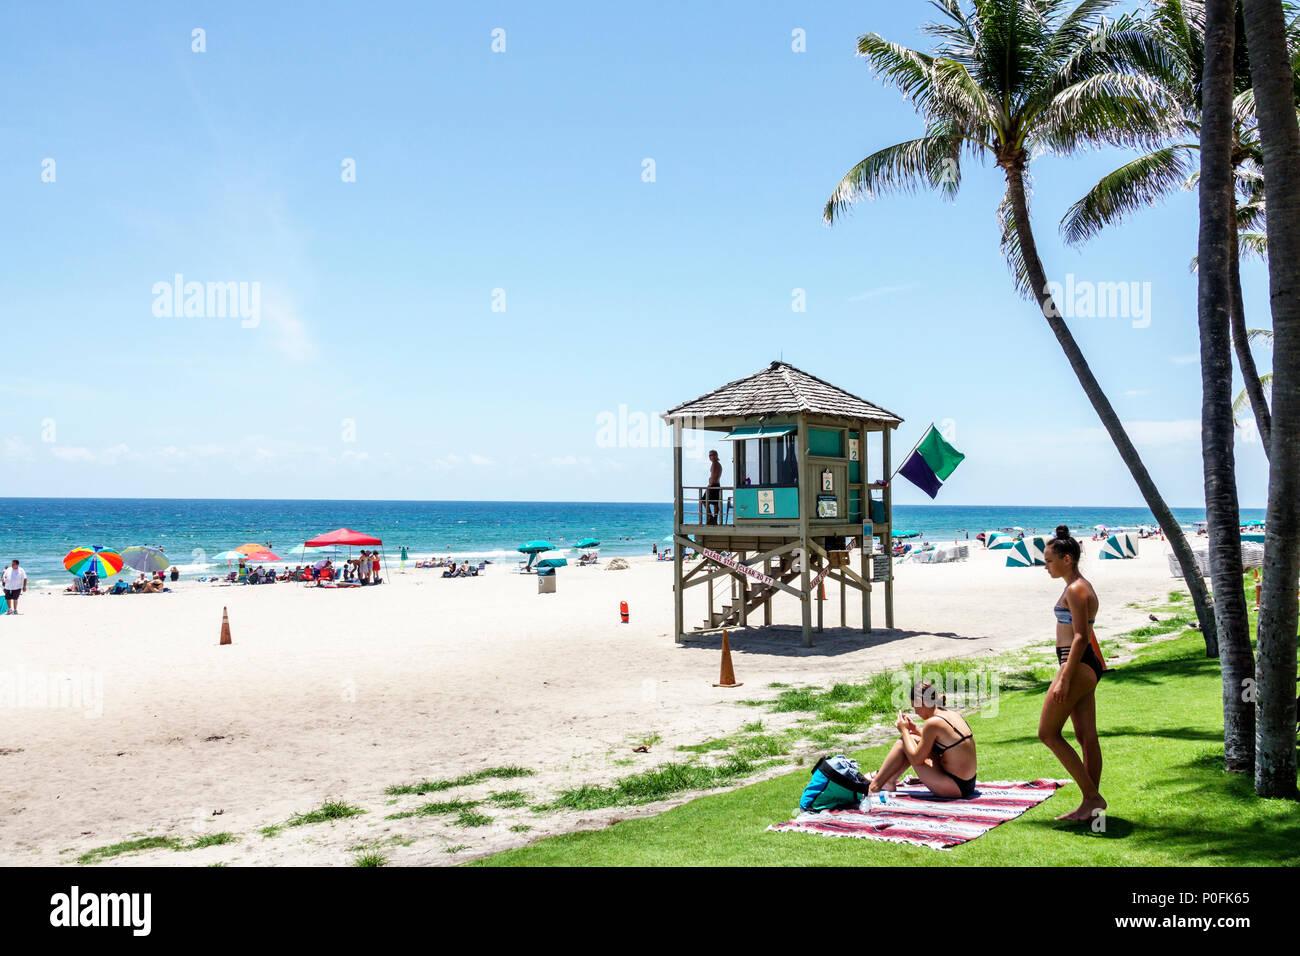 Florida Atlantic Ocean Deerfield Beach water sand lifeguard tower palm trees woman sunbather - Stock Image